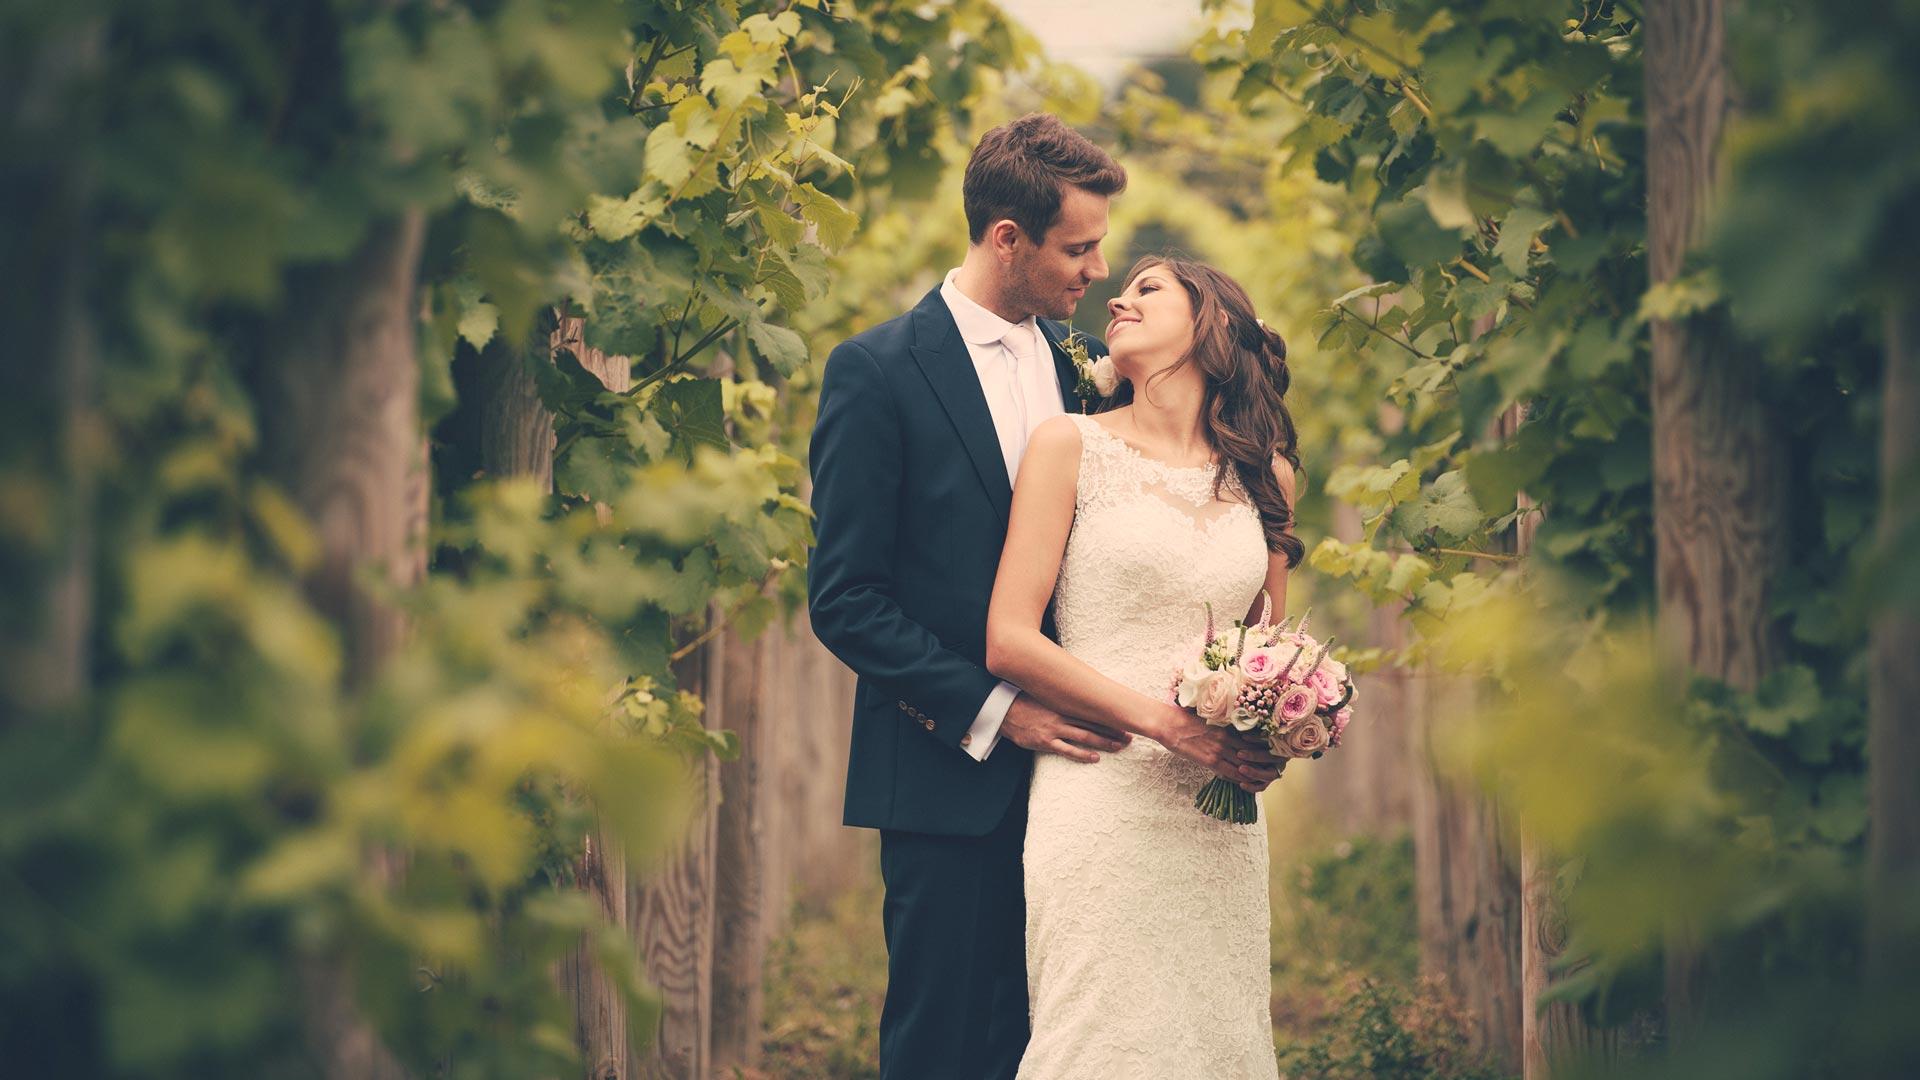 Essex Wedding Photographer Covering Cambridge Hertfordshire